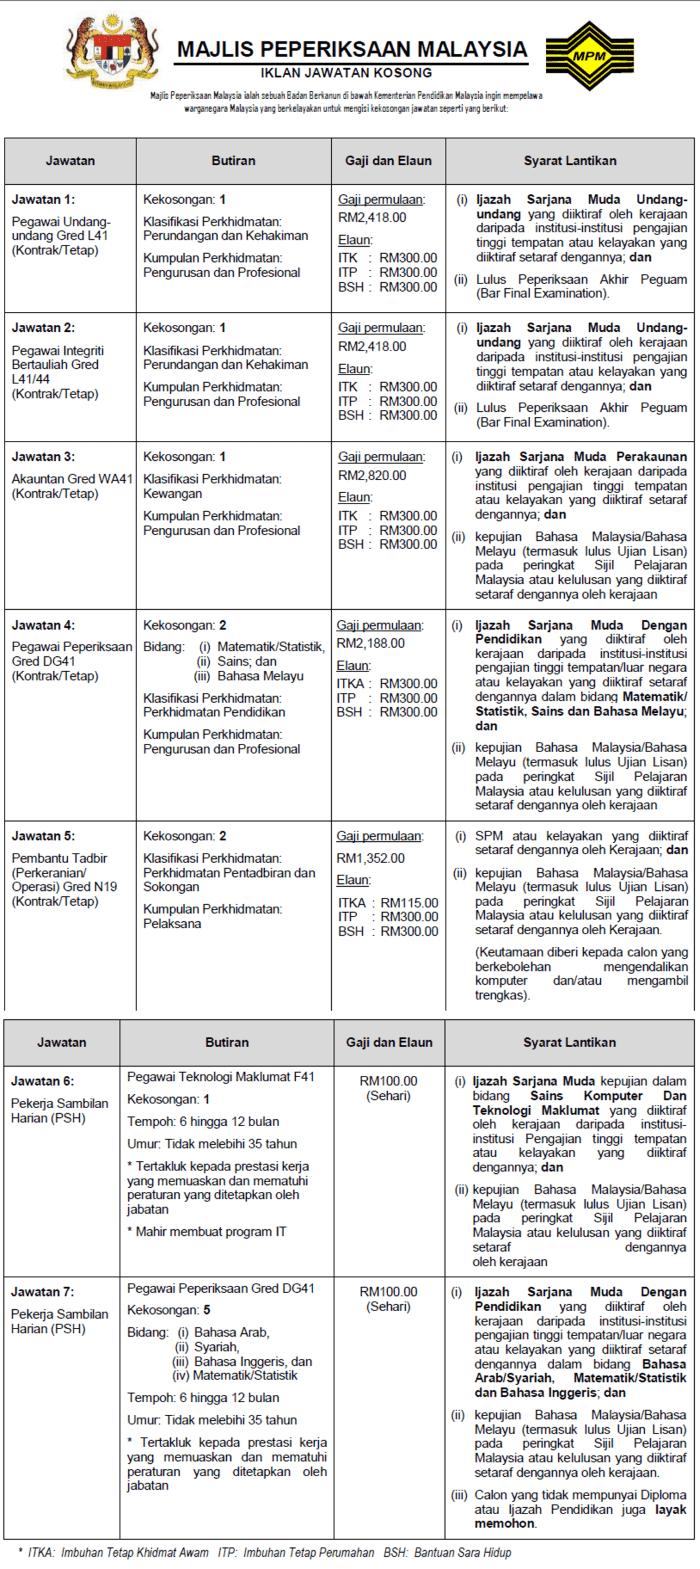 7 Jawatan Kosong Majlis Peperiksaan Malaysia (MPM)